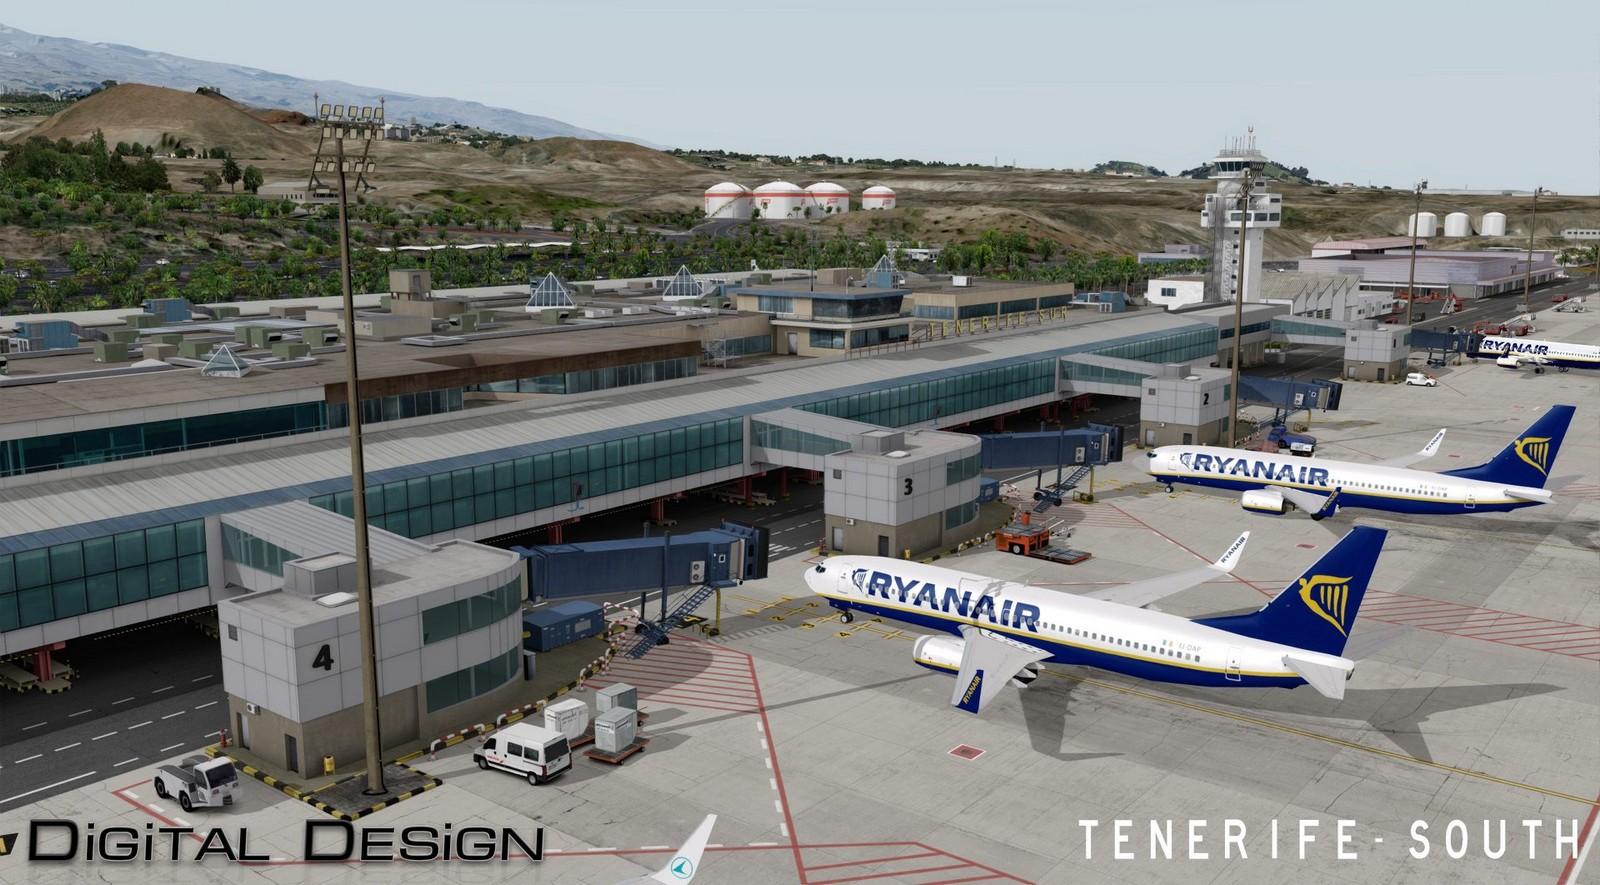 Aeroporto Tenerife Sud : Digital design releases more previews of tenerife south fselite